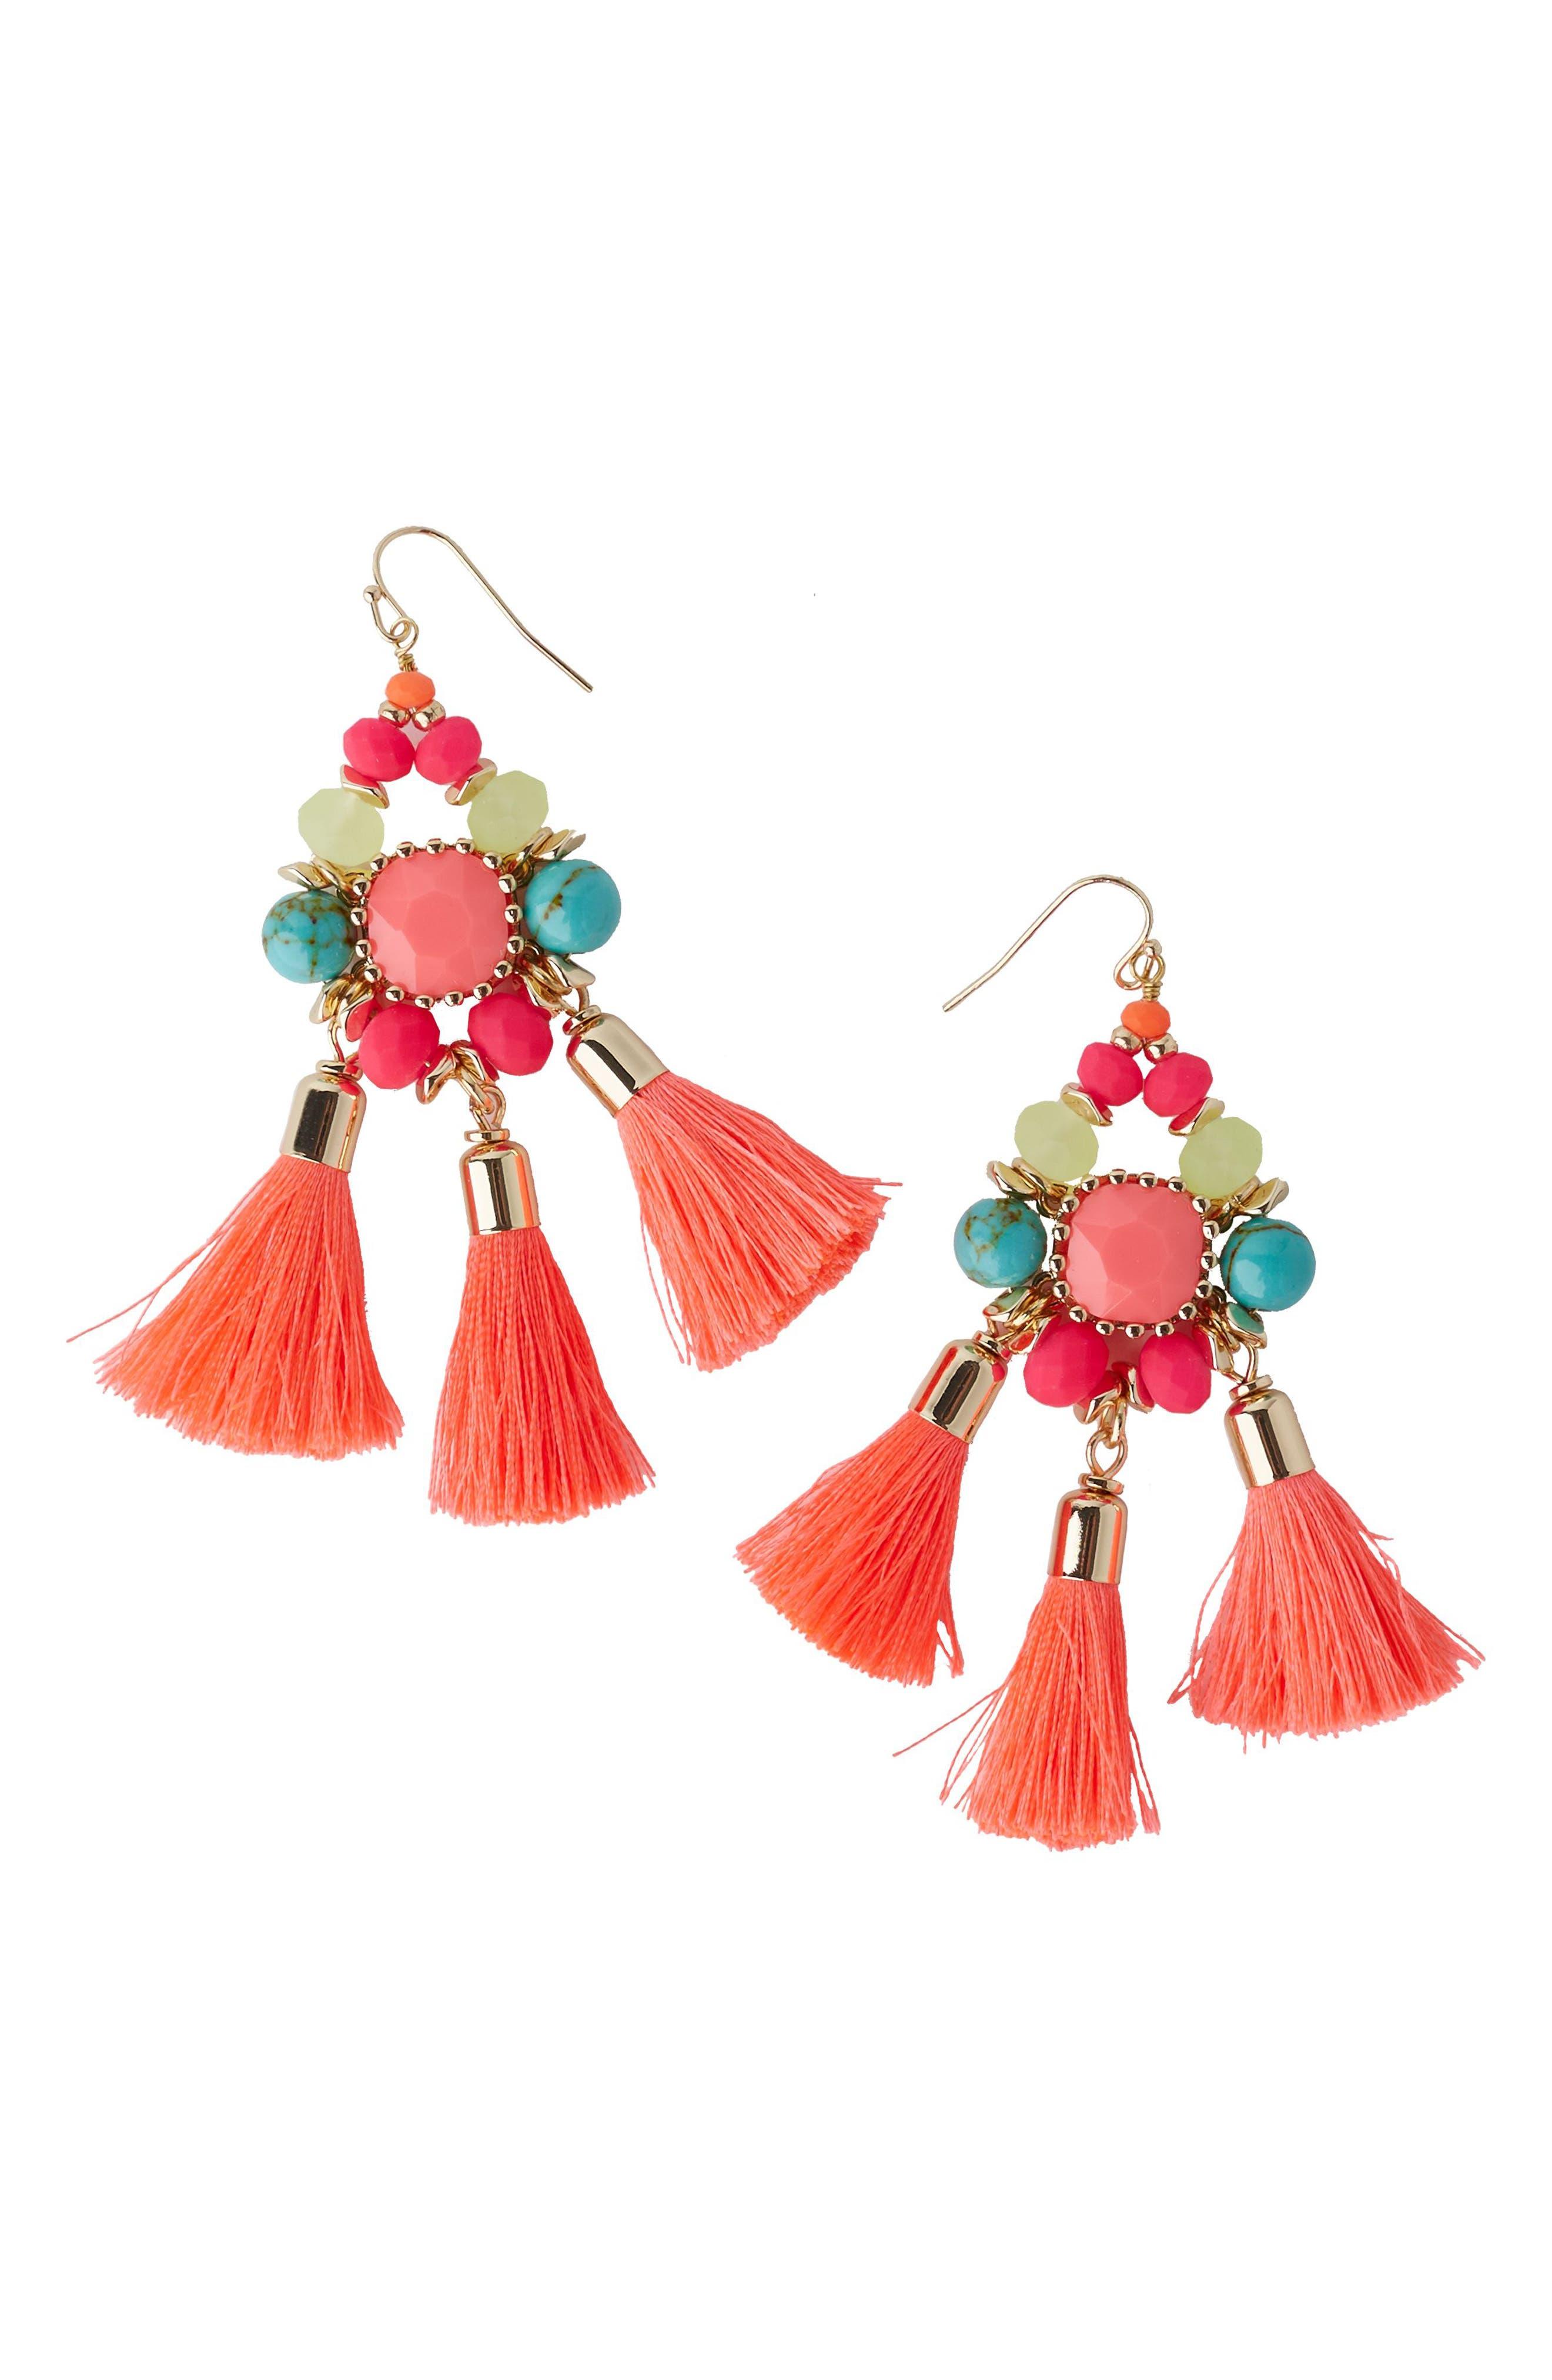 Main Image - Lilly Pulitzer® Boho Beach Drop Earrings